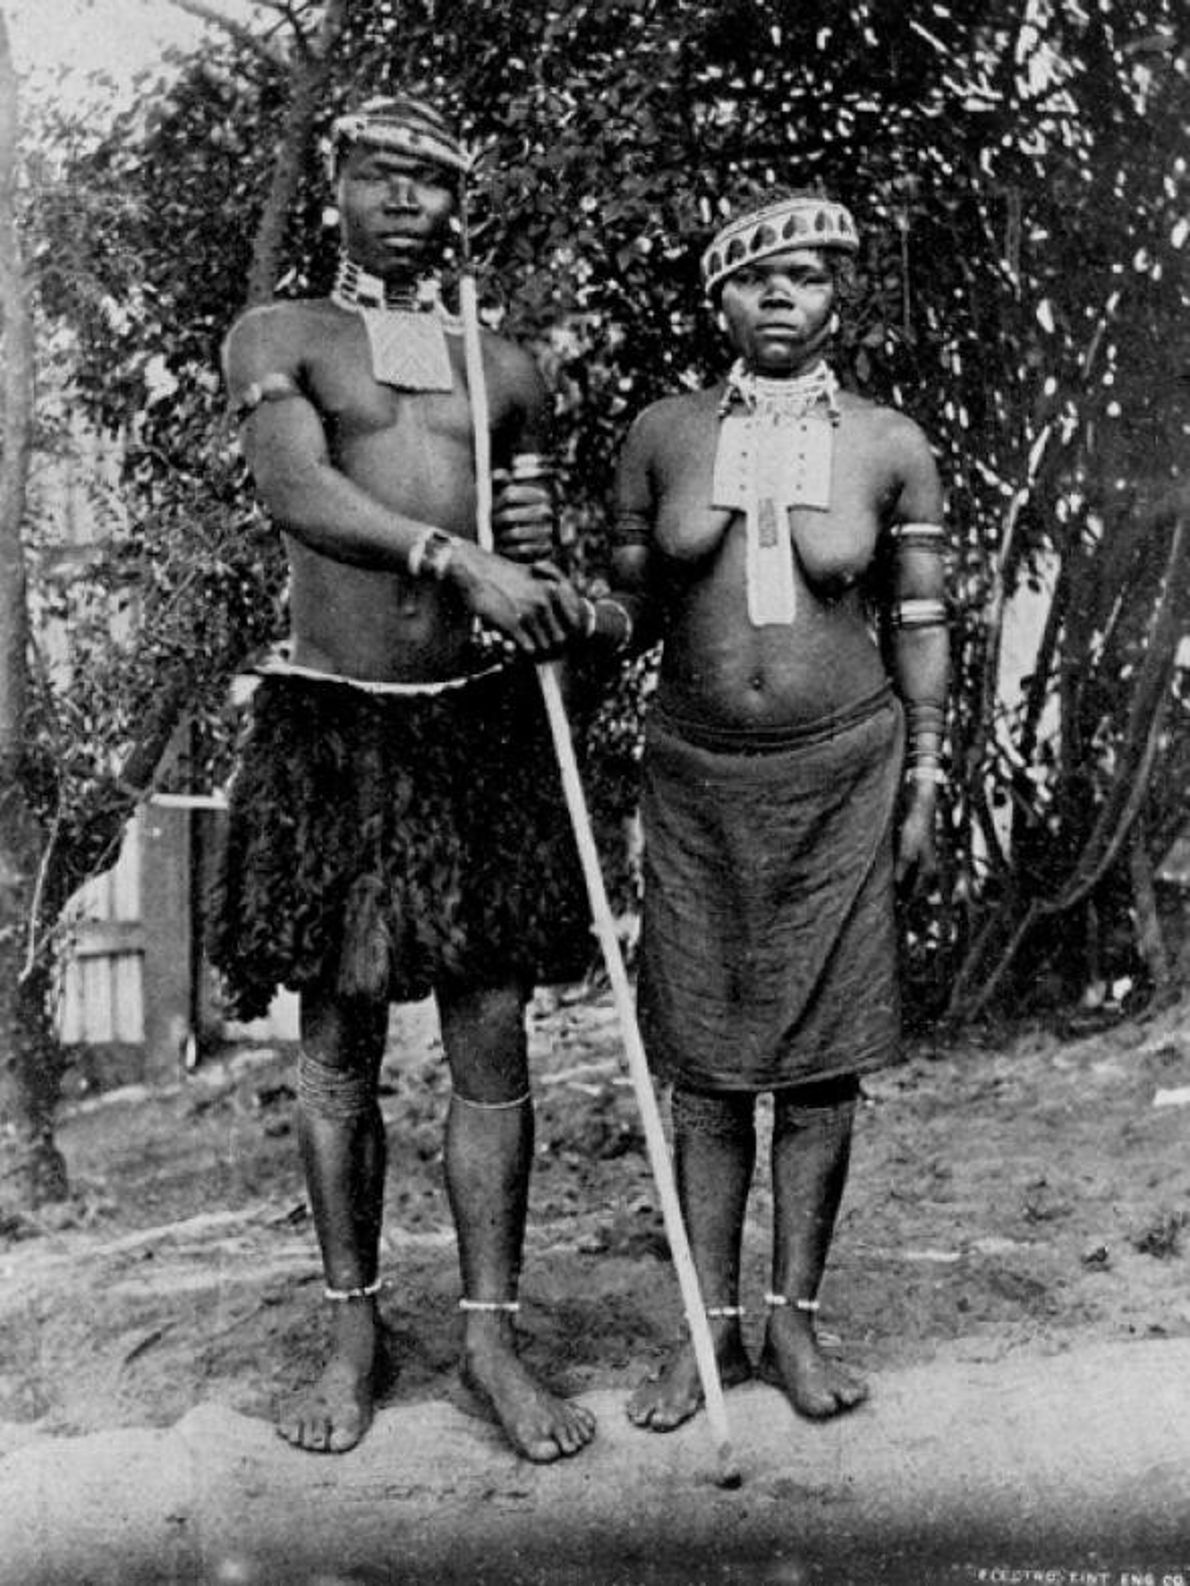 Casal de noivos Zulu em Witwatersrand, África do Sul